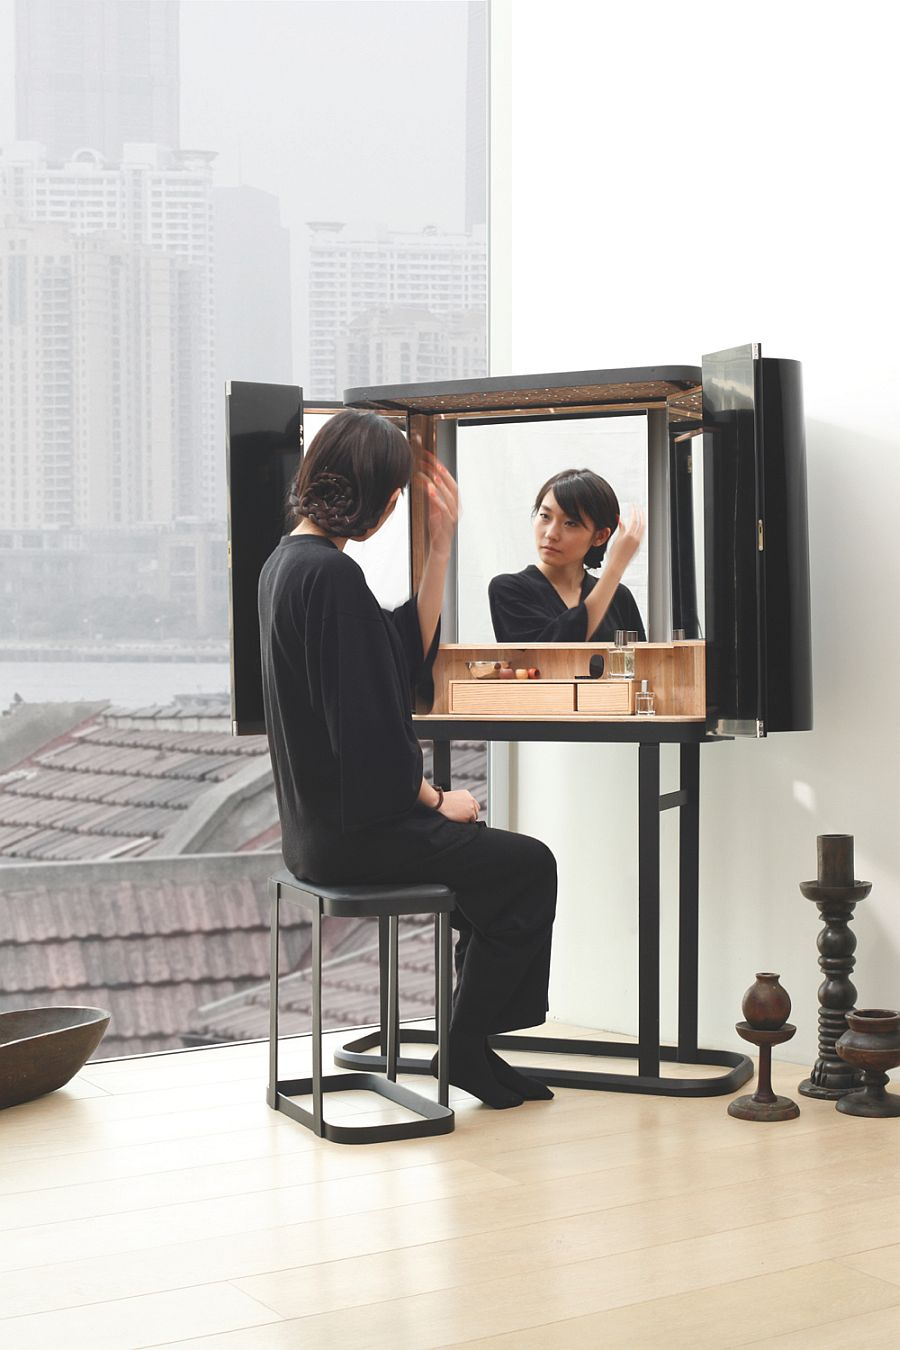 The Narcissist by Neri & Hu